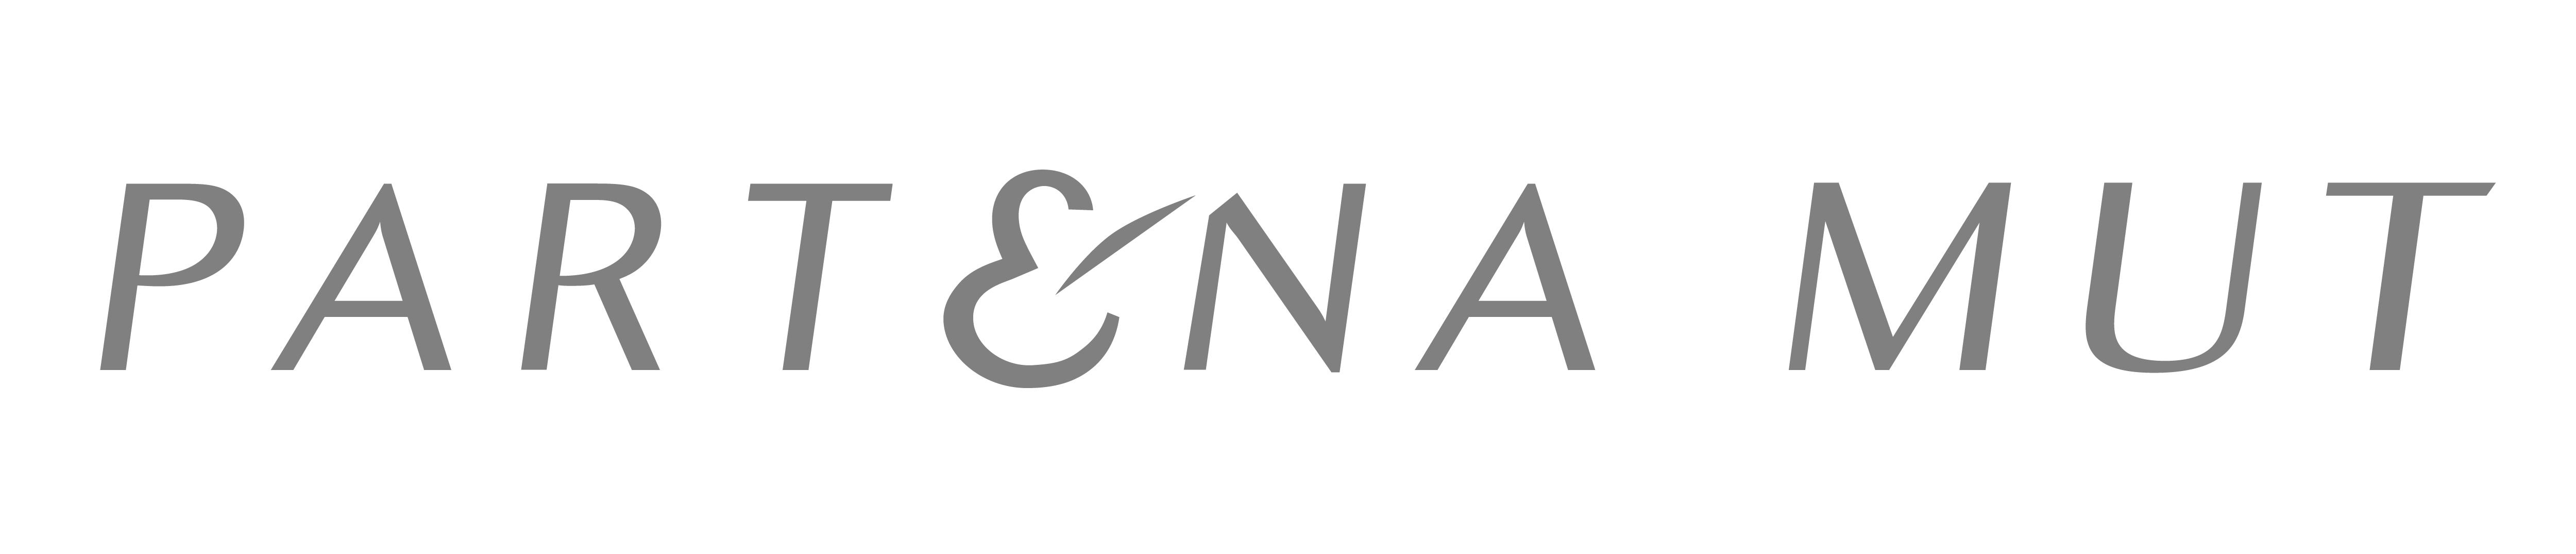 Partenamut Logo